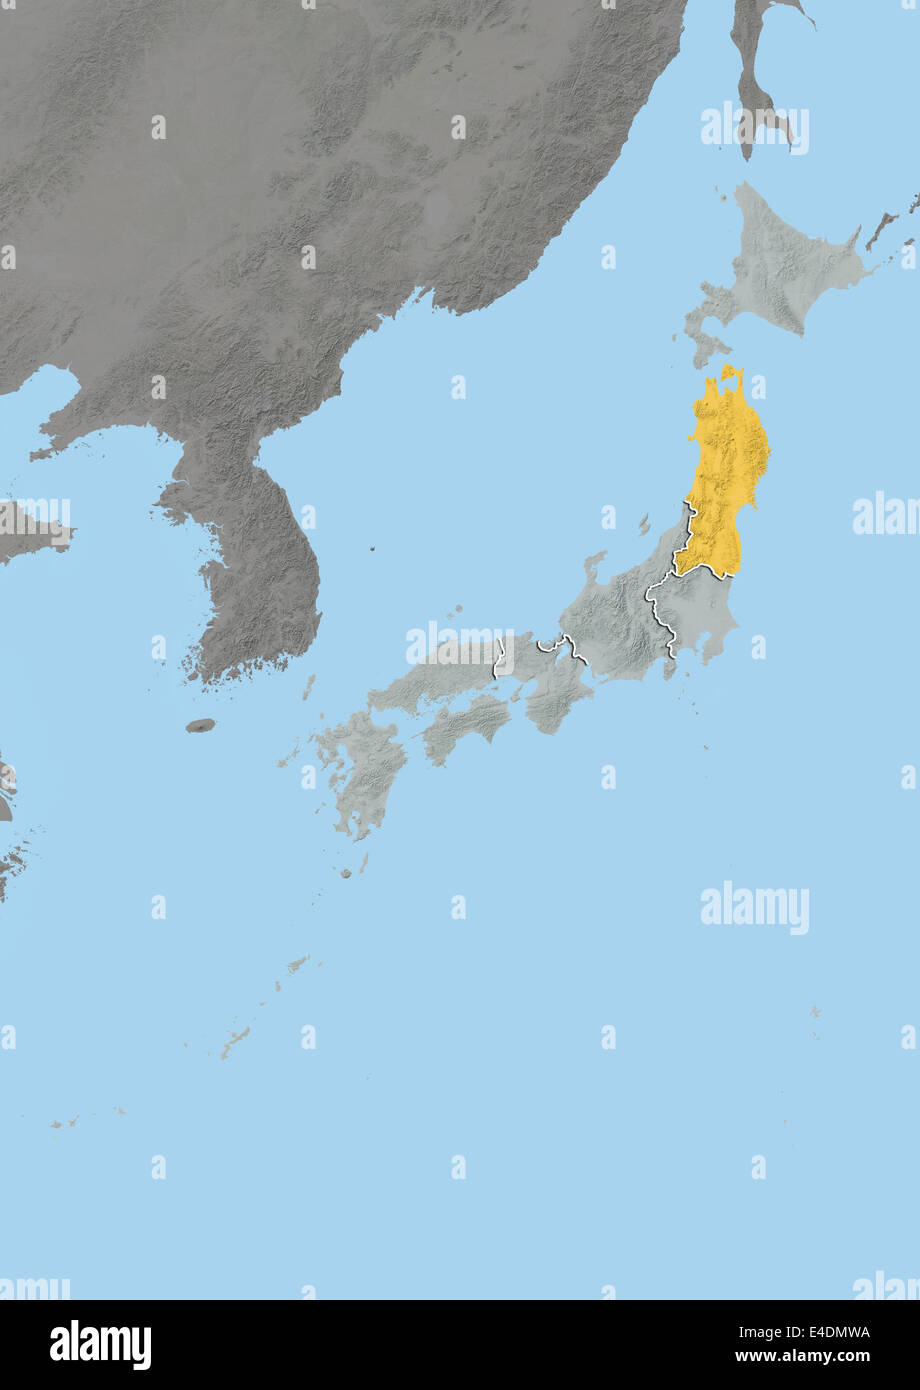 Region of Tohoku, Japan, Relief Map Stock Photo